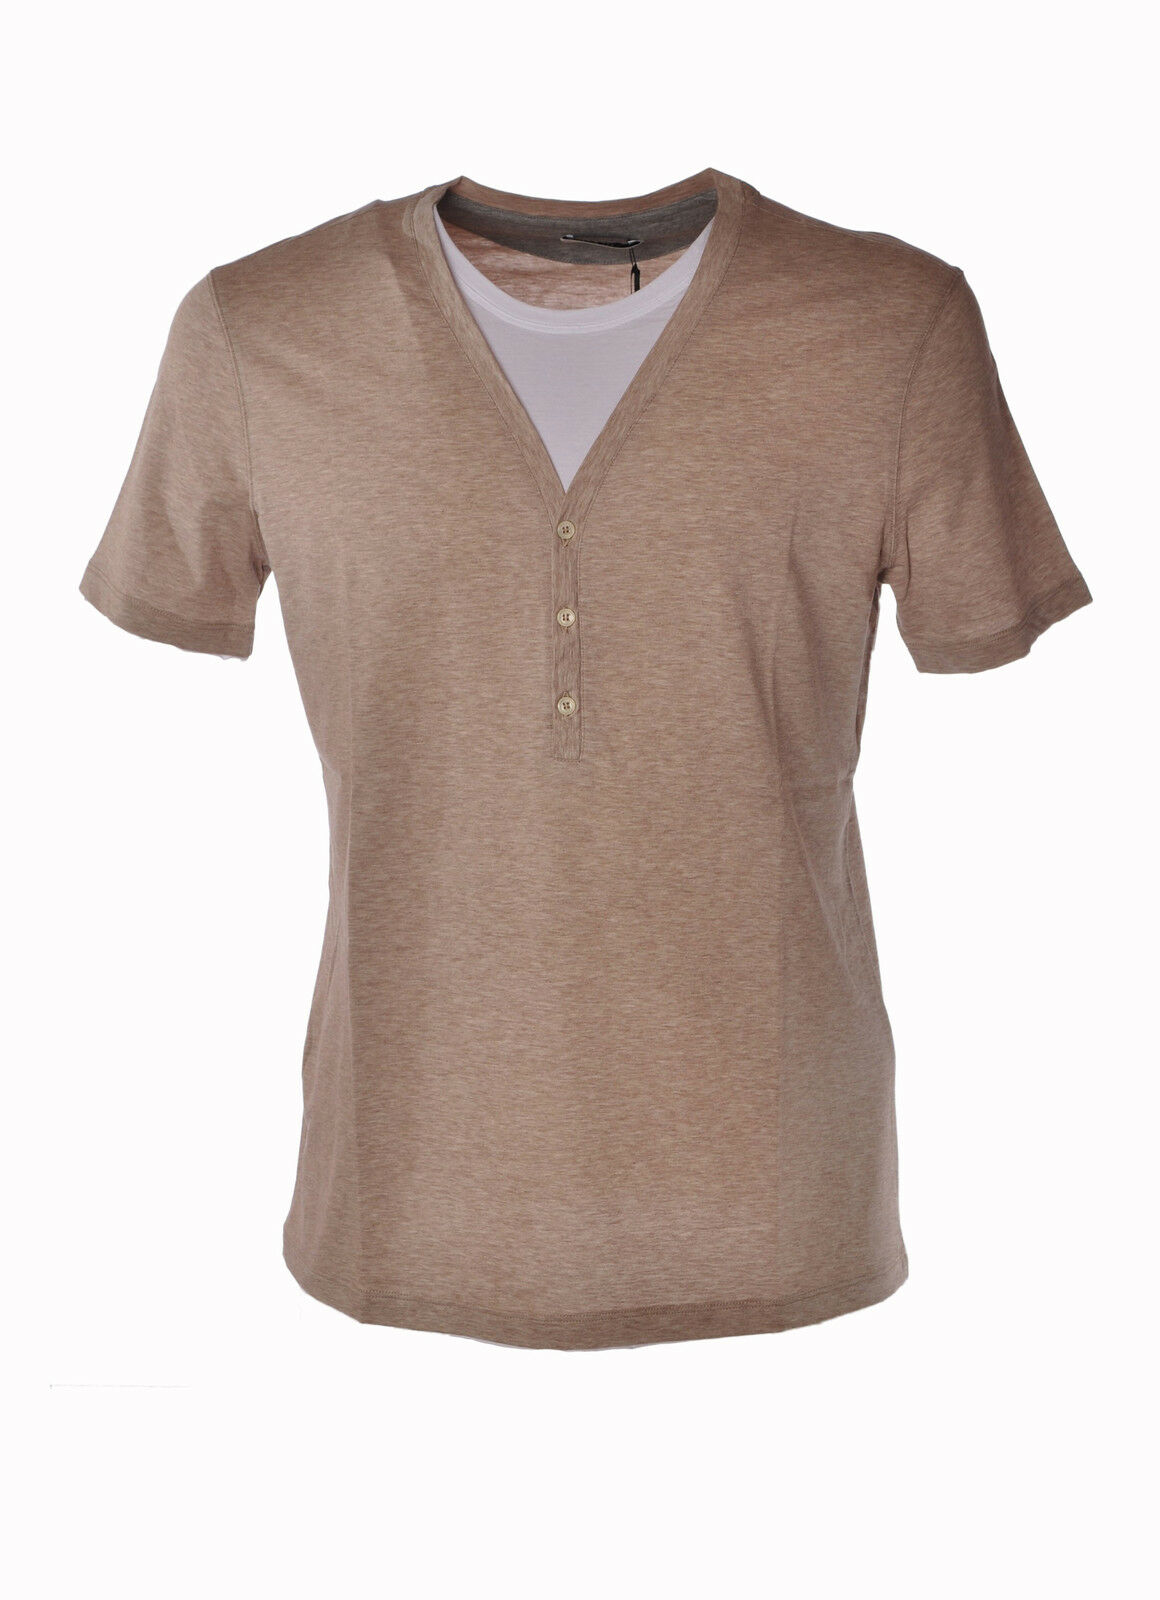 Paolo Pecora - Topwear-T-shirts - Man - Beige - 3596006C190356